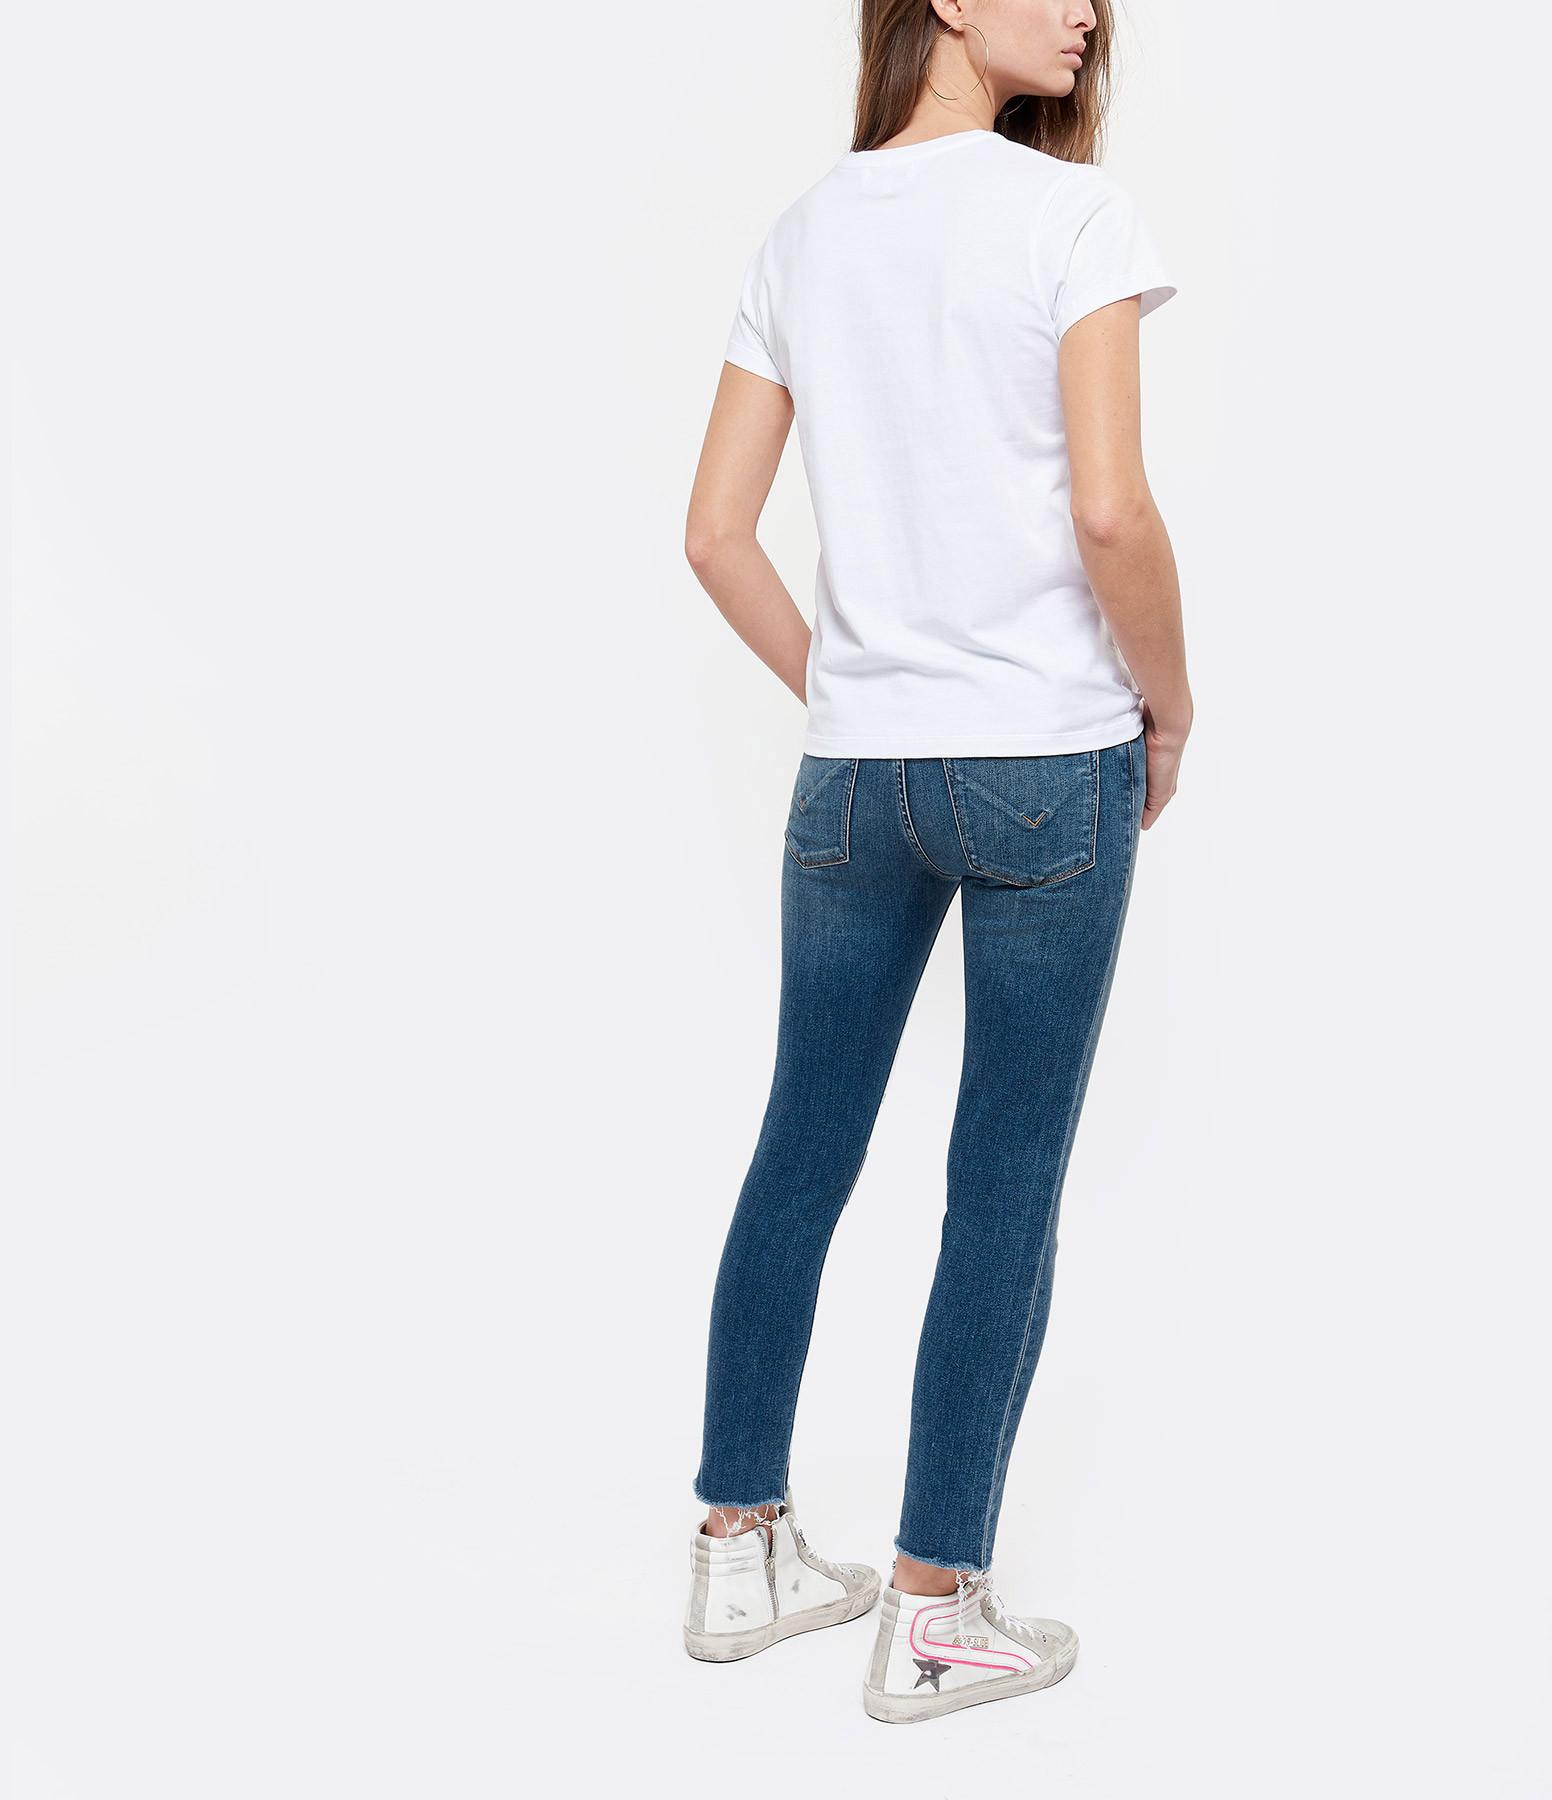 MAISON LABICHE - Tee-shirt Boyfriend Blondie Coton Blanc Noir